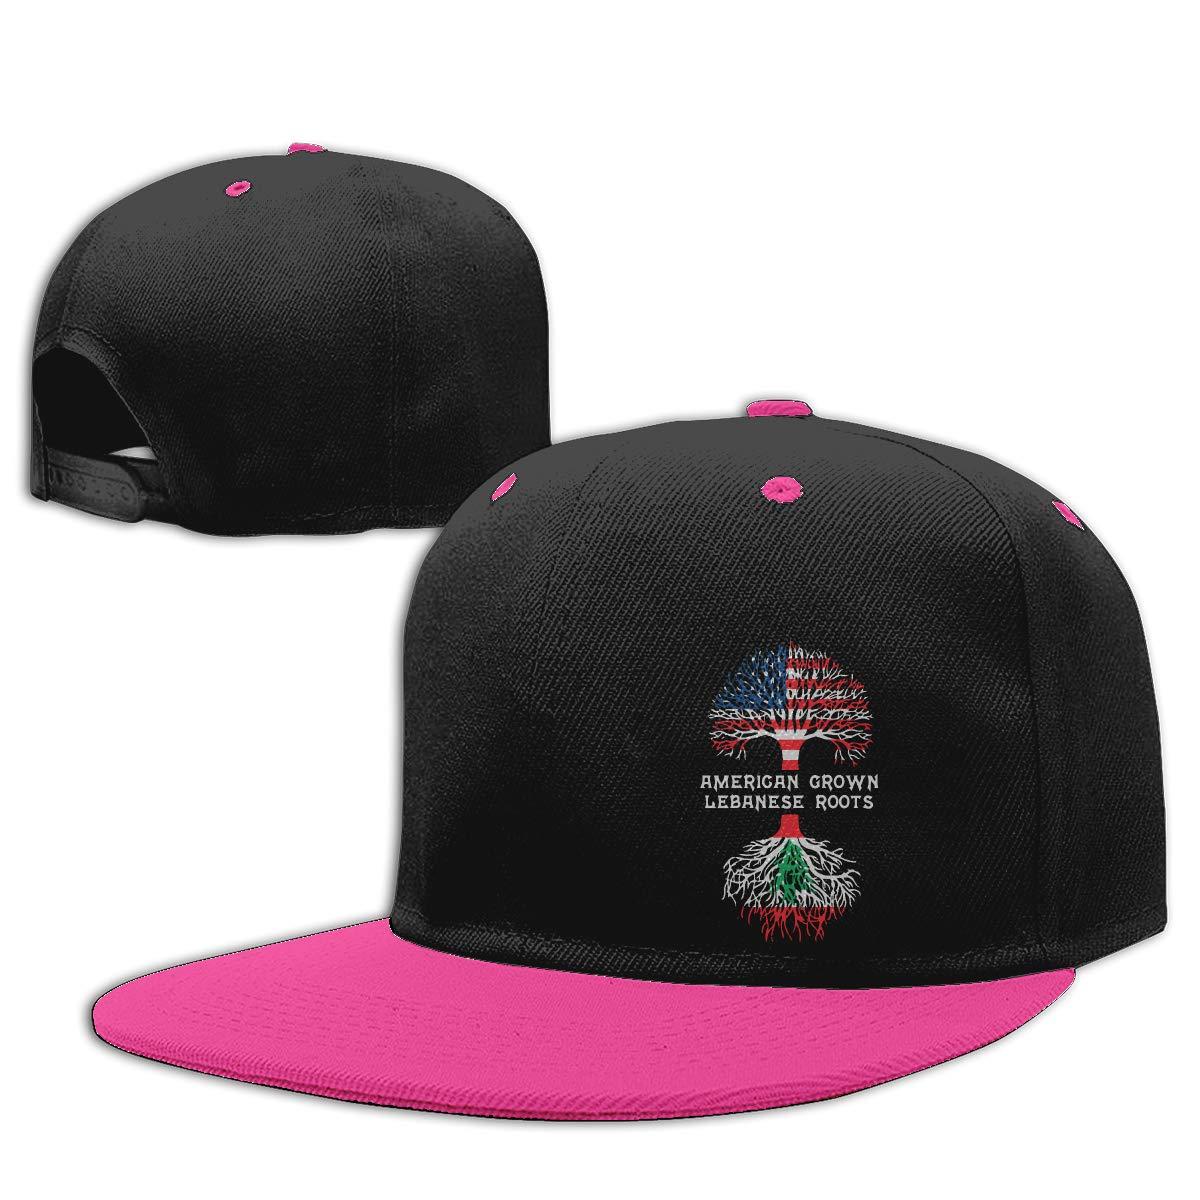 American Grown with Lebanese Roots Unisex Flat Brim Baseball Caps NMG-01 Women Men Trucker Cap